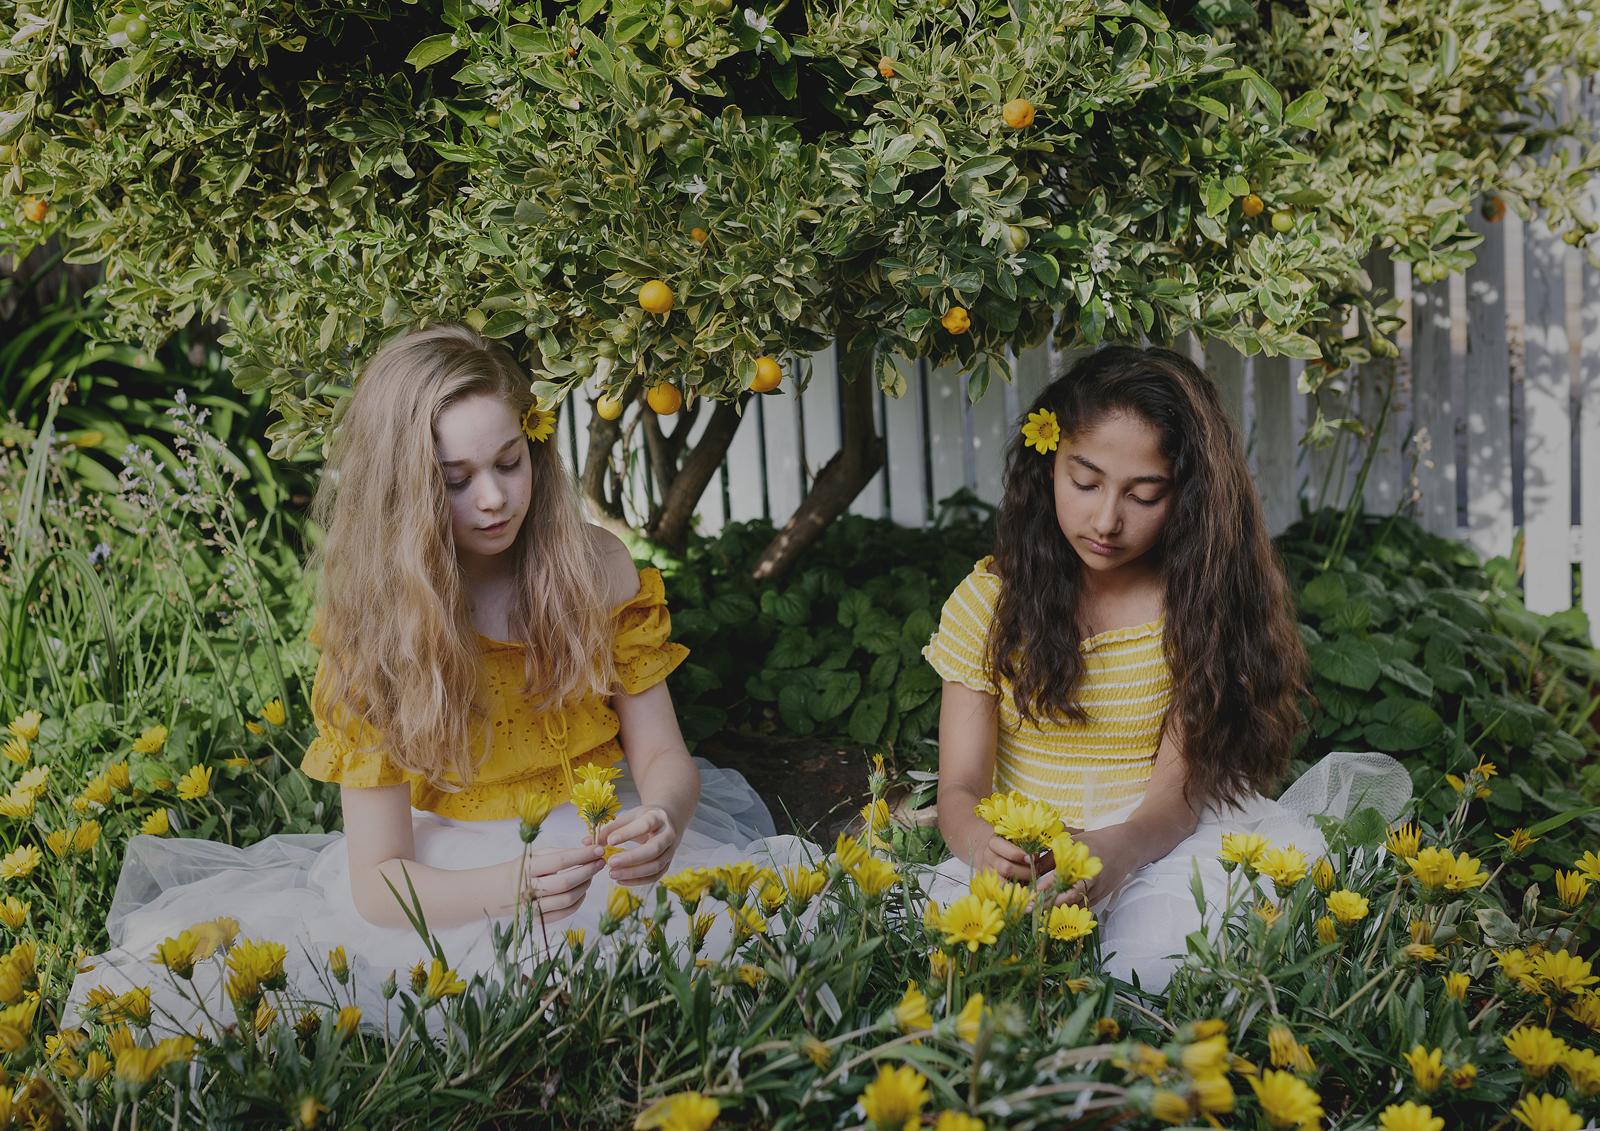 Best friends making daisy chains